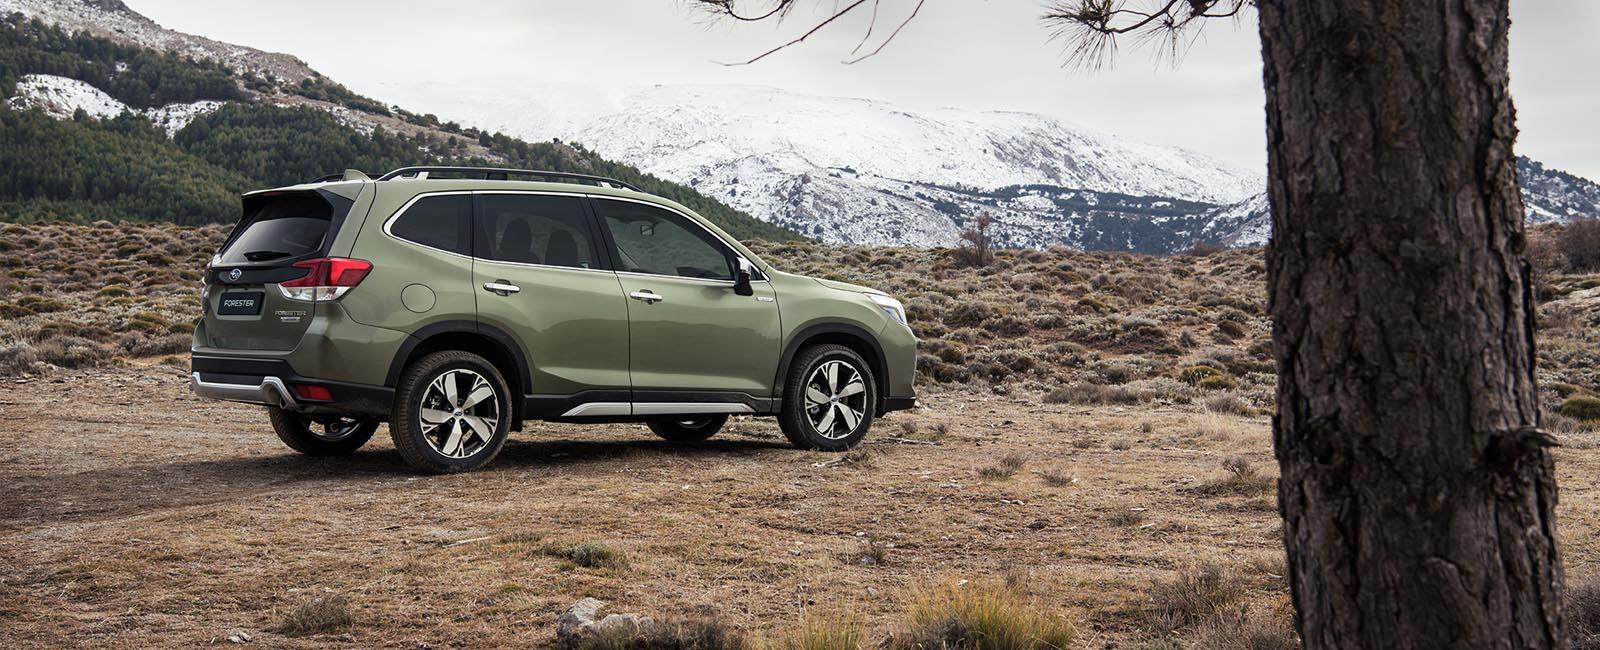 Subaru Forester i fjellandskap